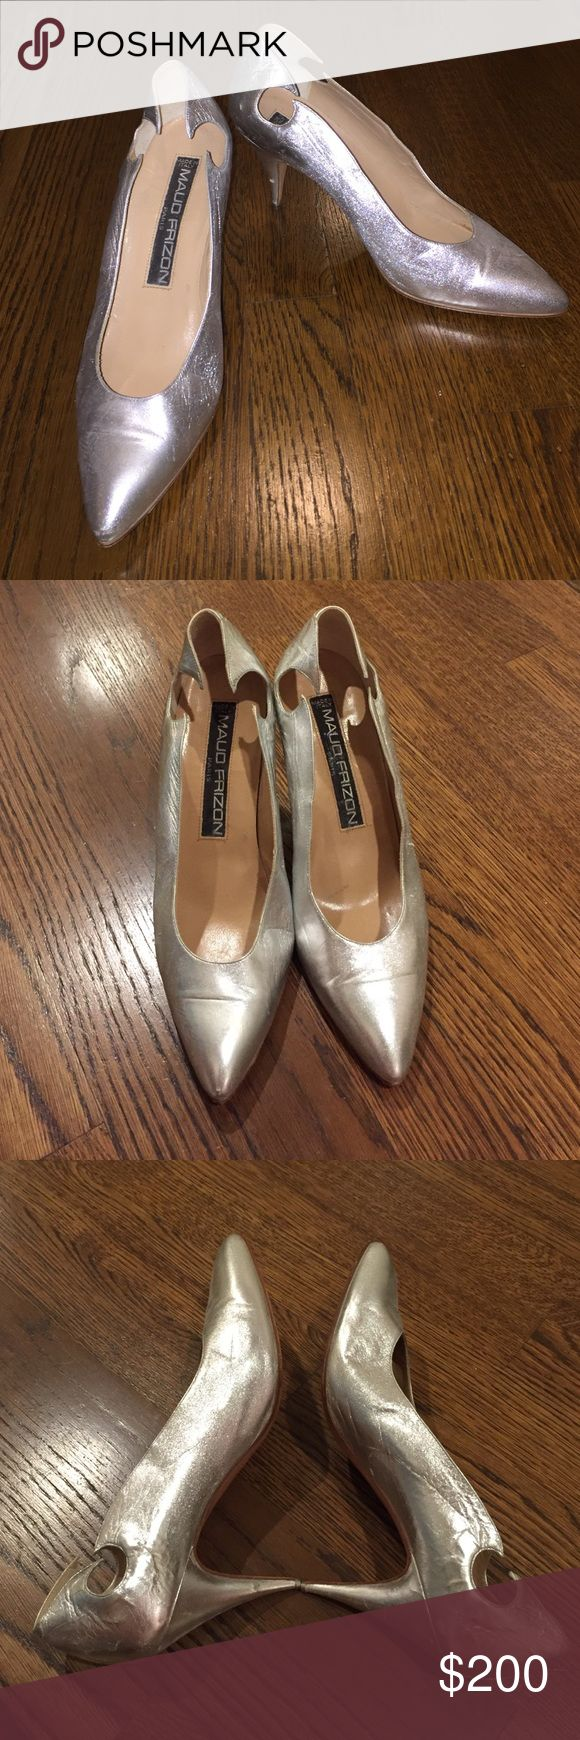 Vintage Maud Frizon Paris Heels Never worn! Vintage high end Maud Frizon. Maud Frizon Paris Shoes Heels